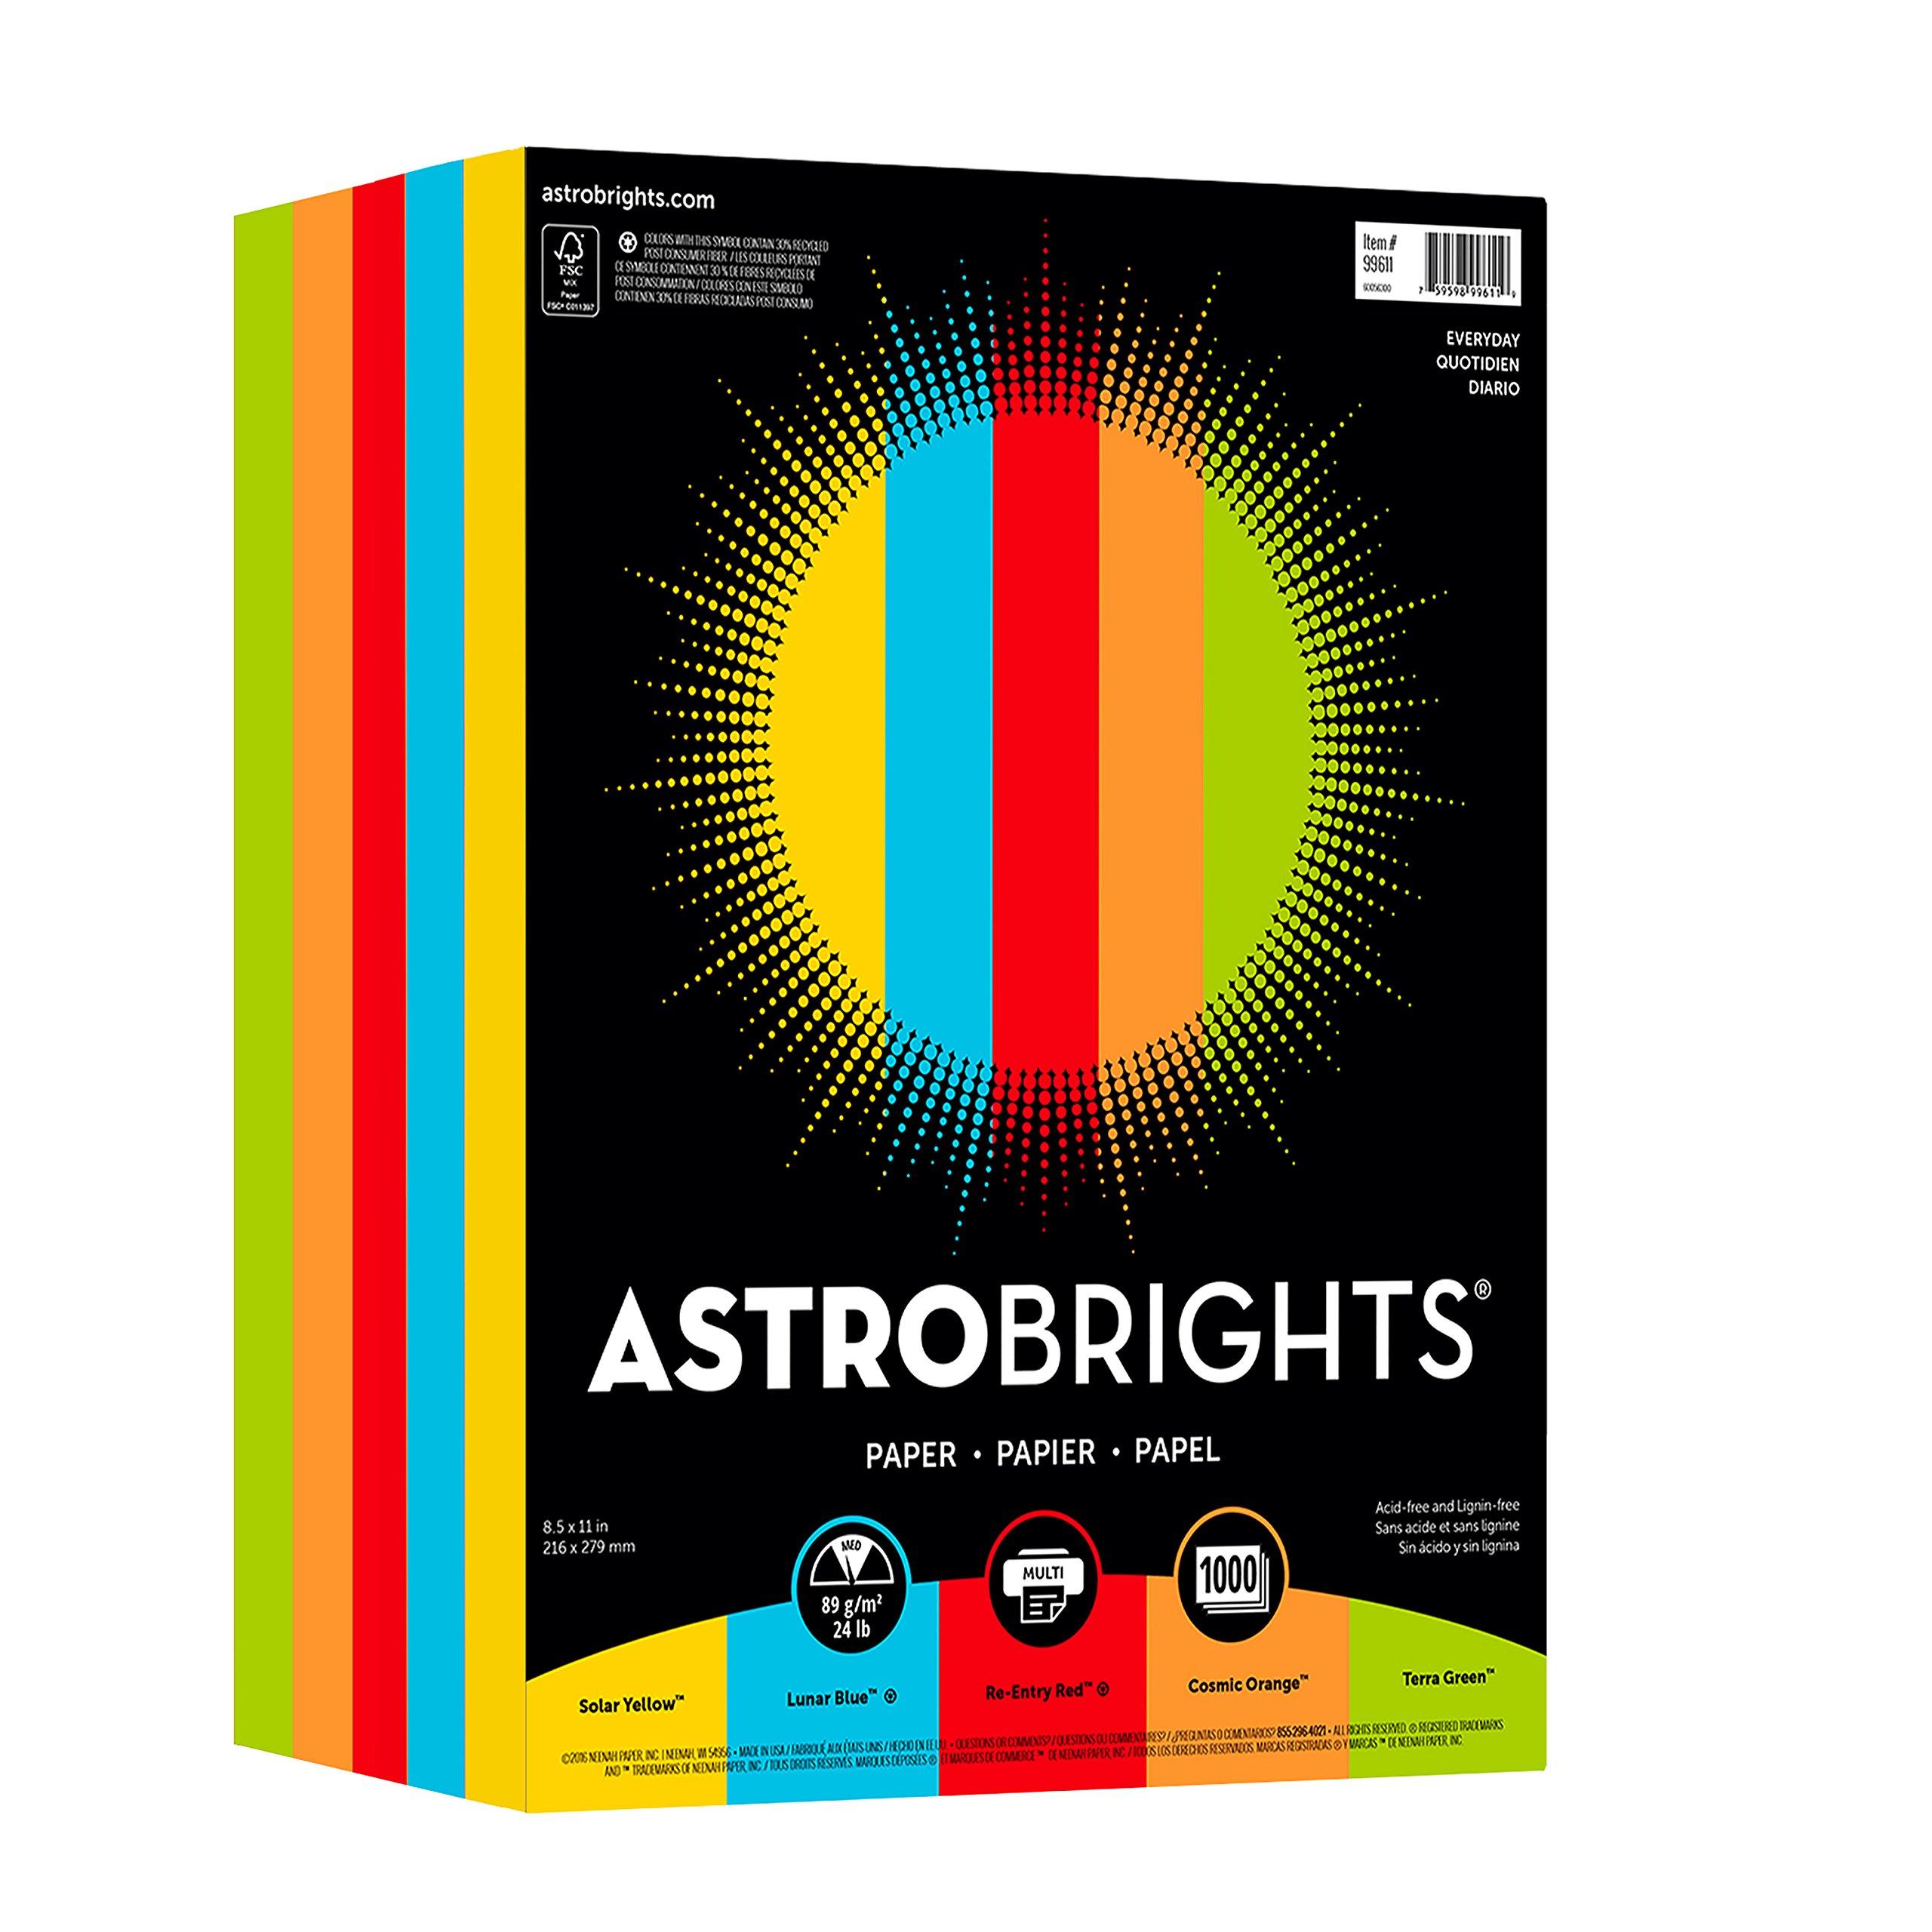 Astrobrights Color Paper, 8.5'' x 11'', 24 lb/89 gsm, ''Everyday'' 5-Color Assortment, 1000 Sheets (99609)